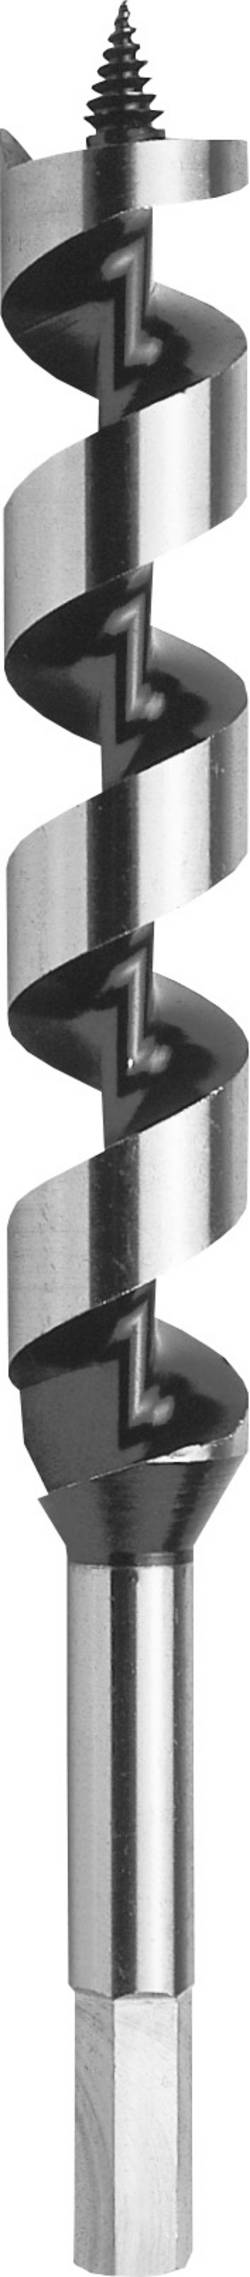 Hadovitý vrták 14 mm Bosch Accessories 2609255240, uchycení šestihran, délka 450 mm 1 ks